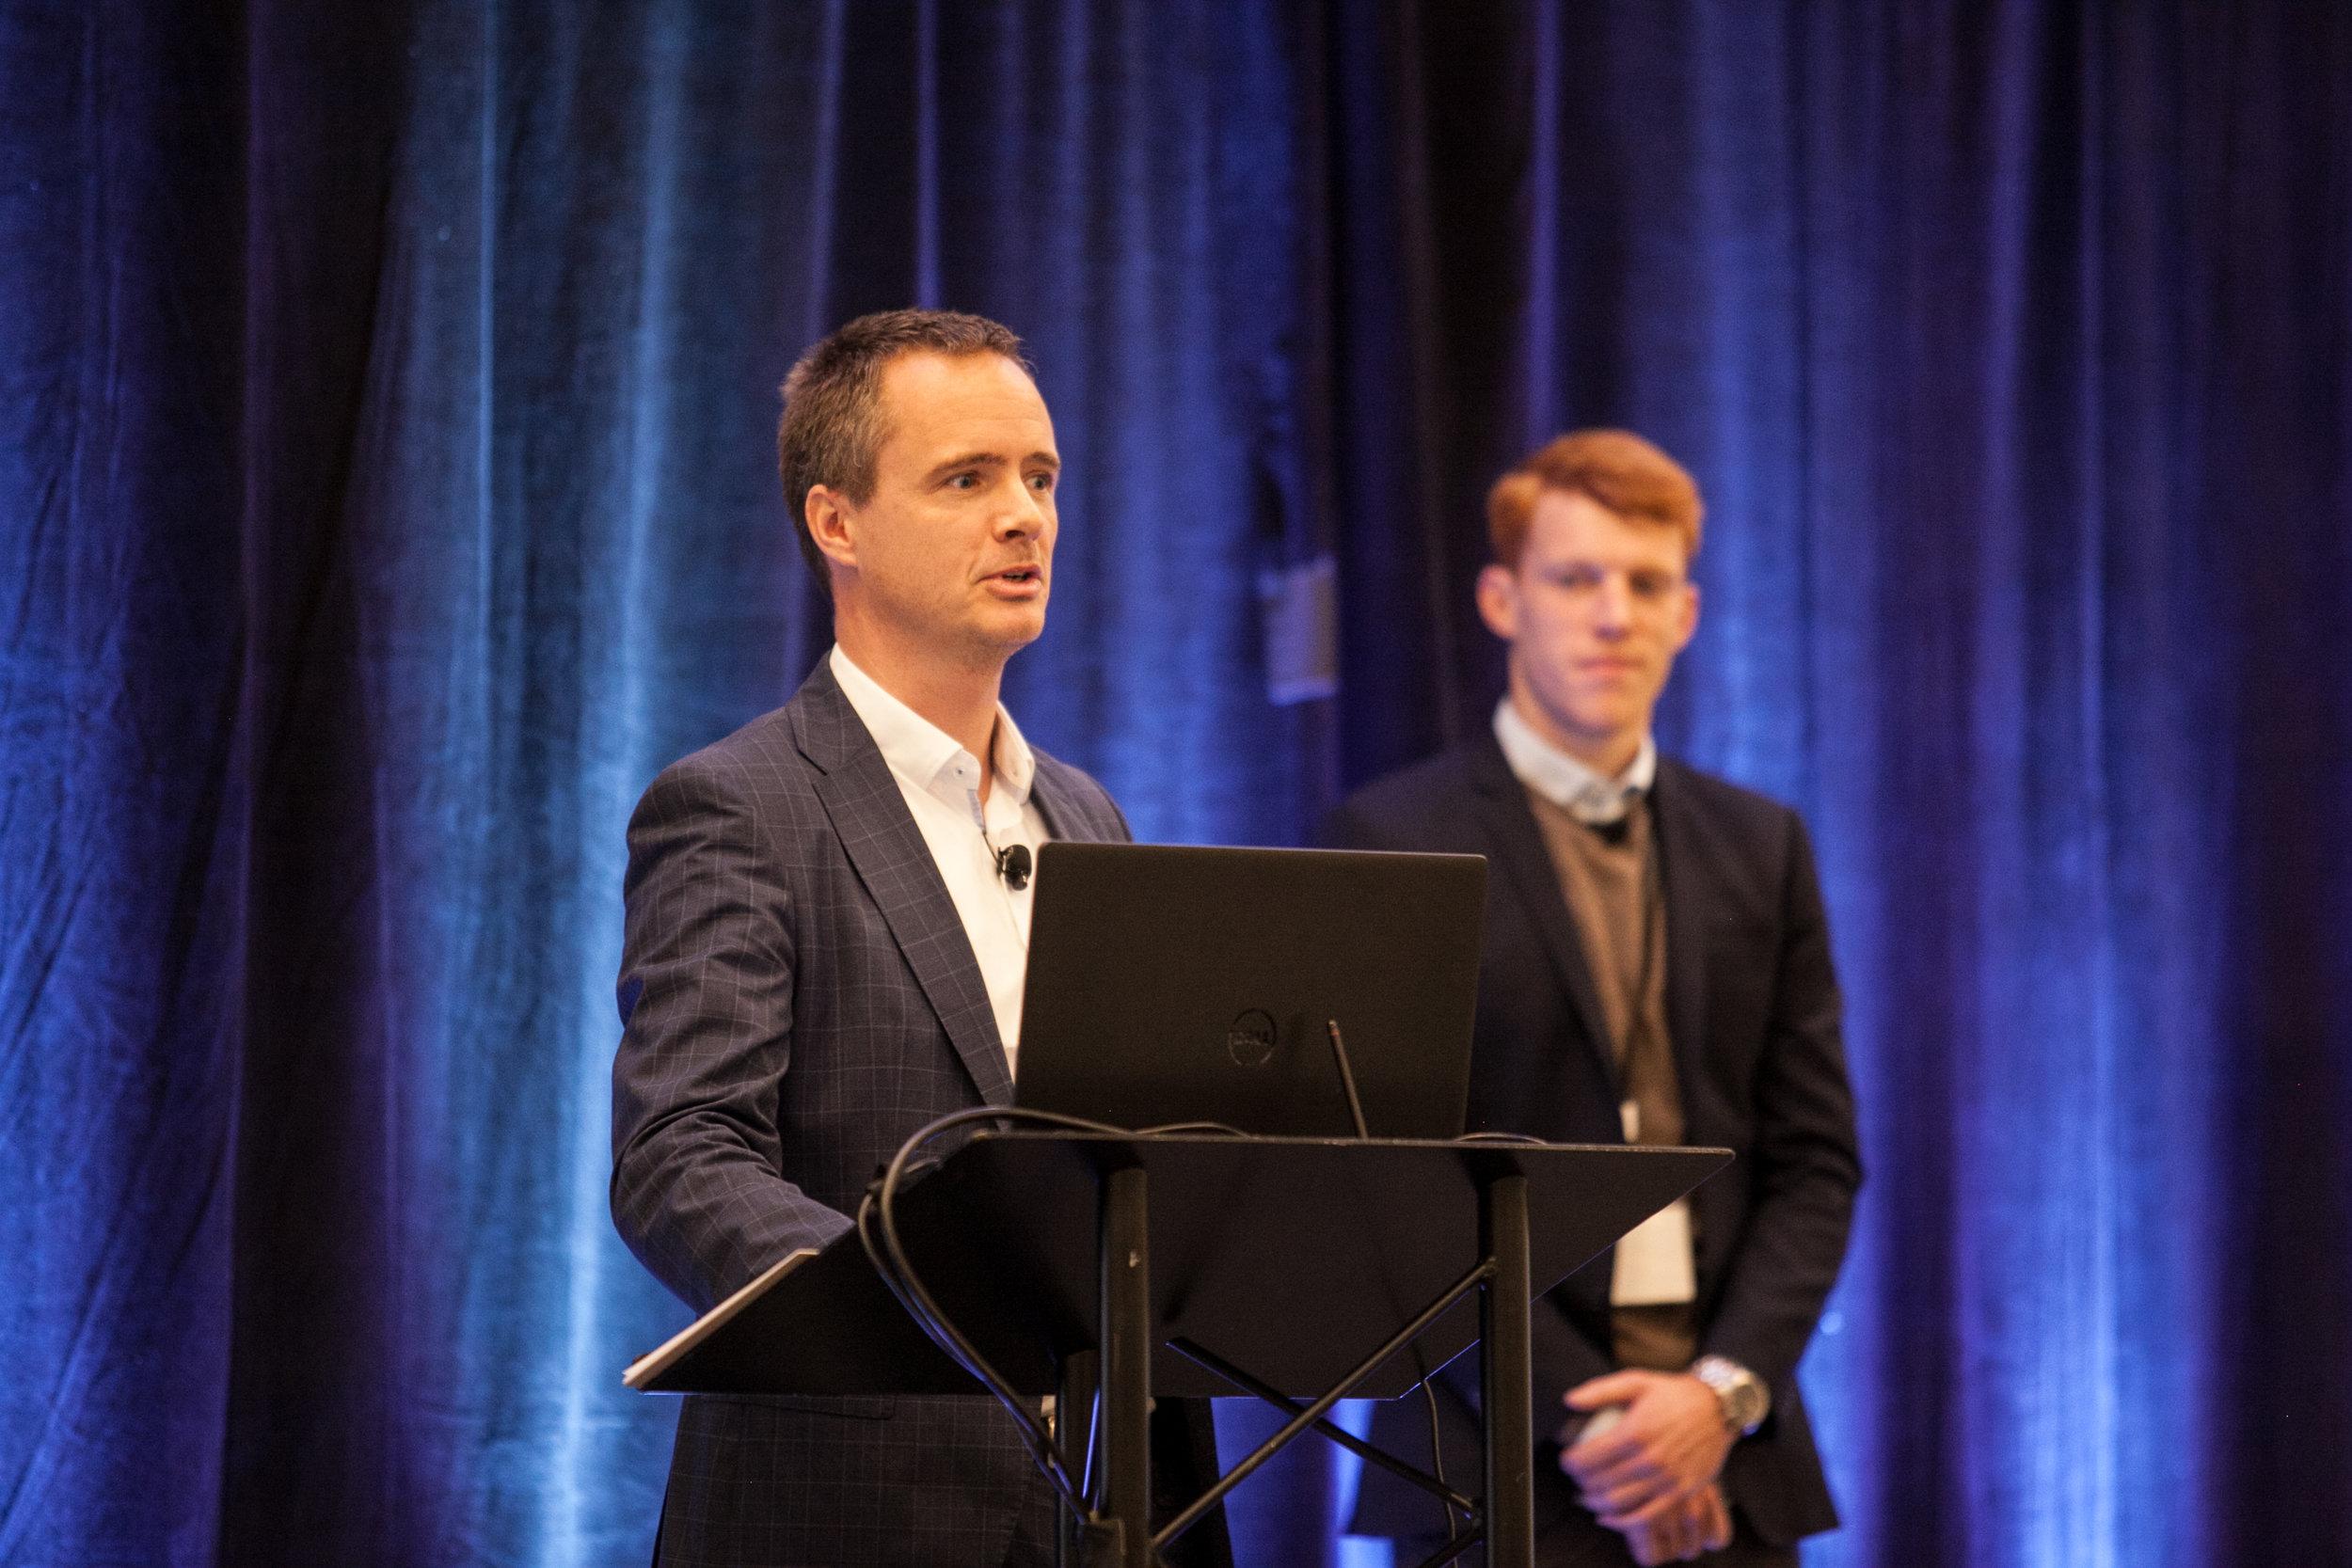 Kristian Puggaard from DAMVAD presenting on Machine Learning